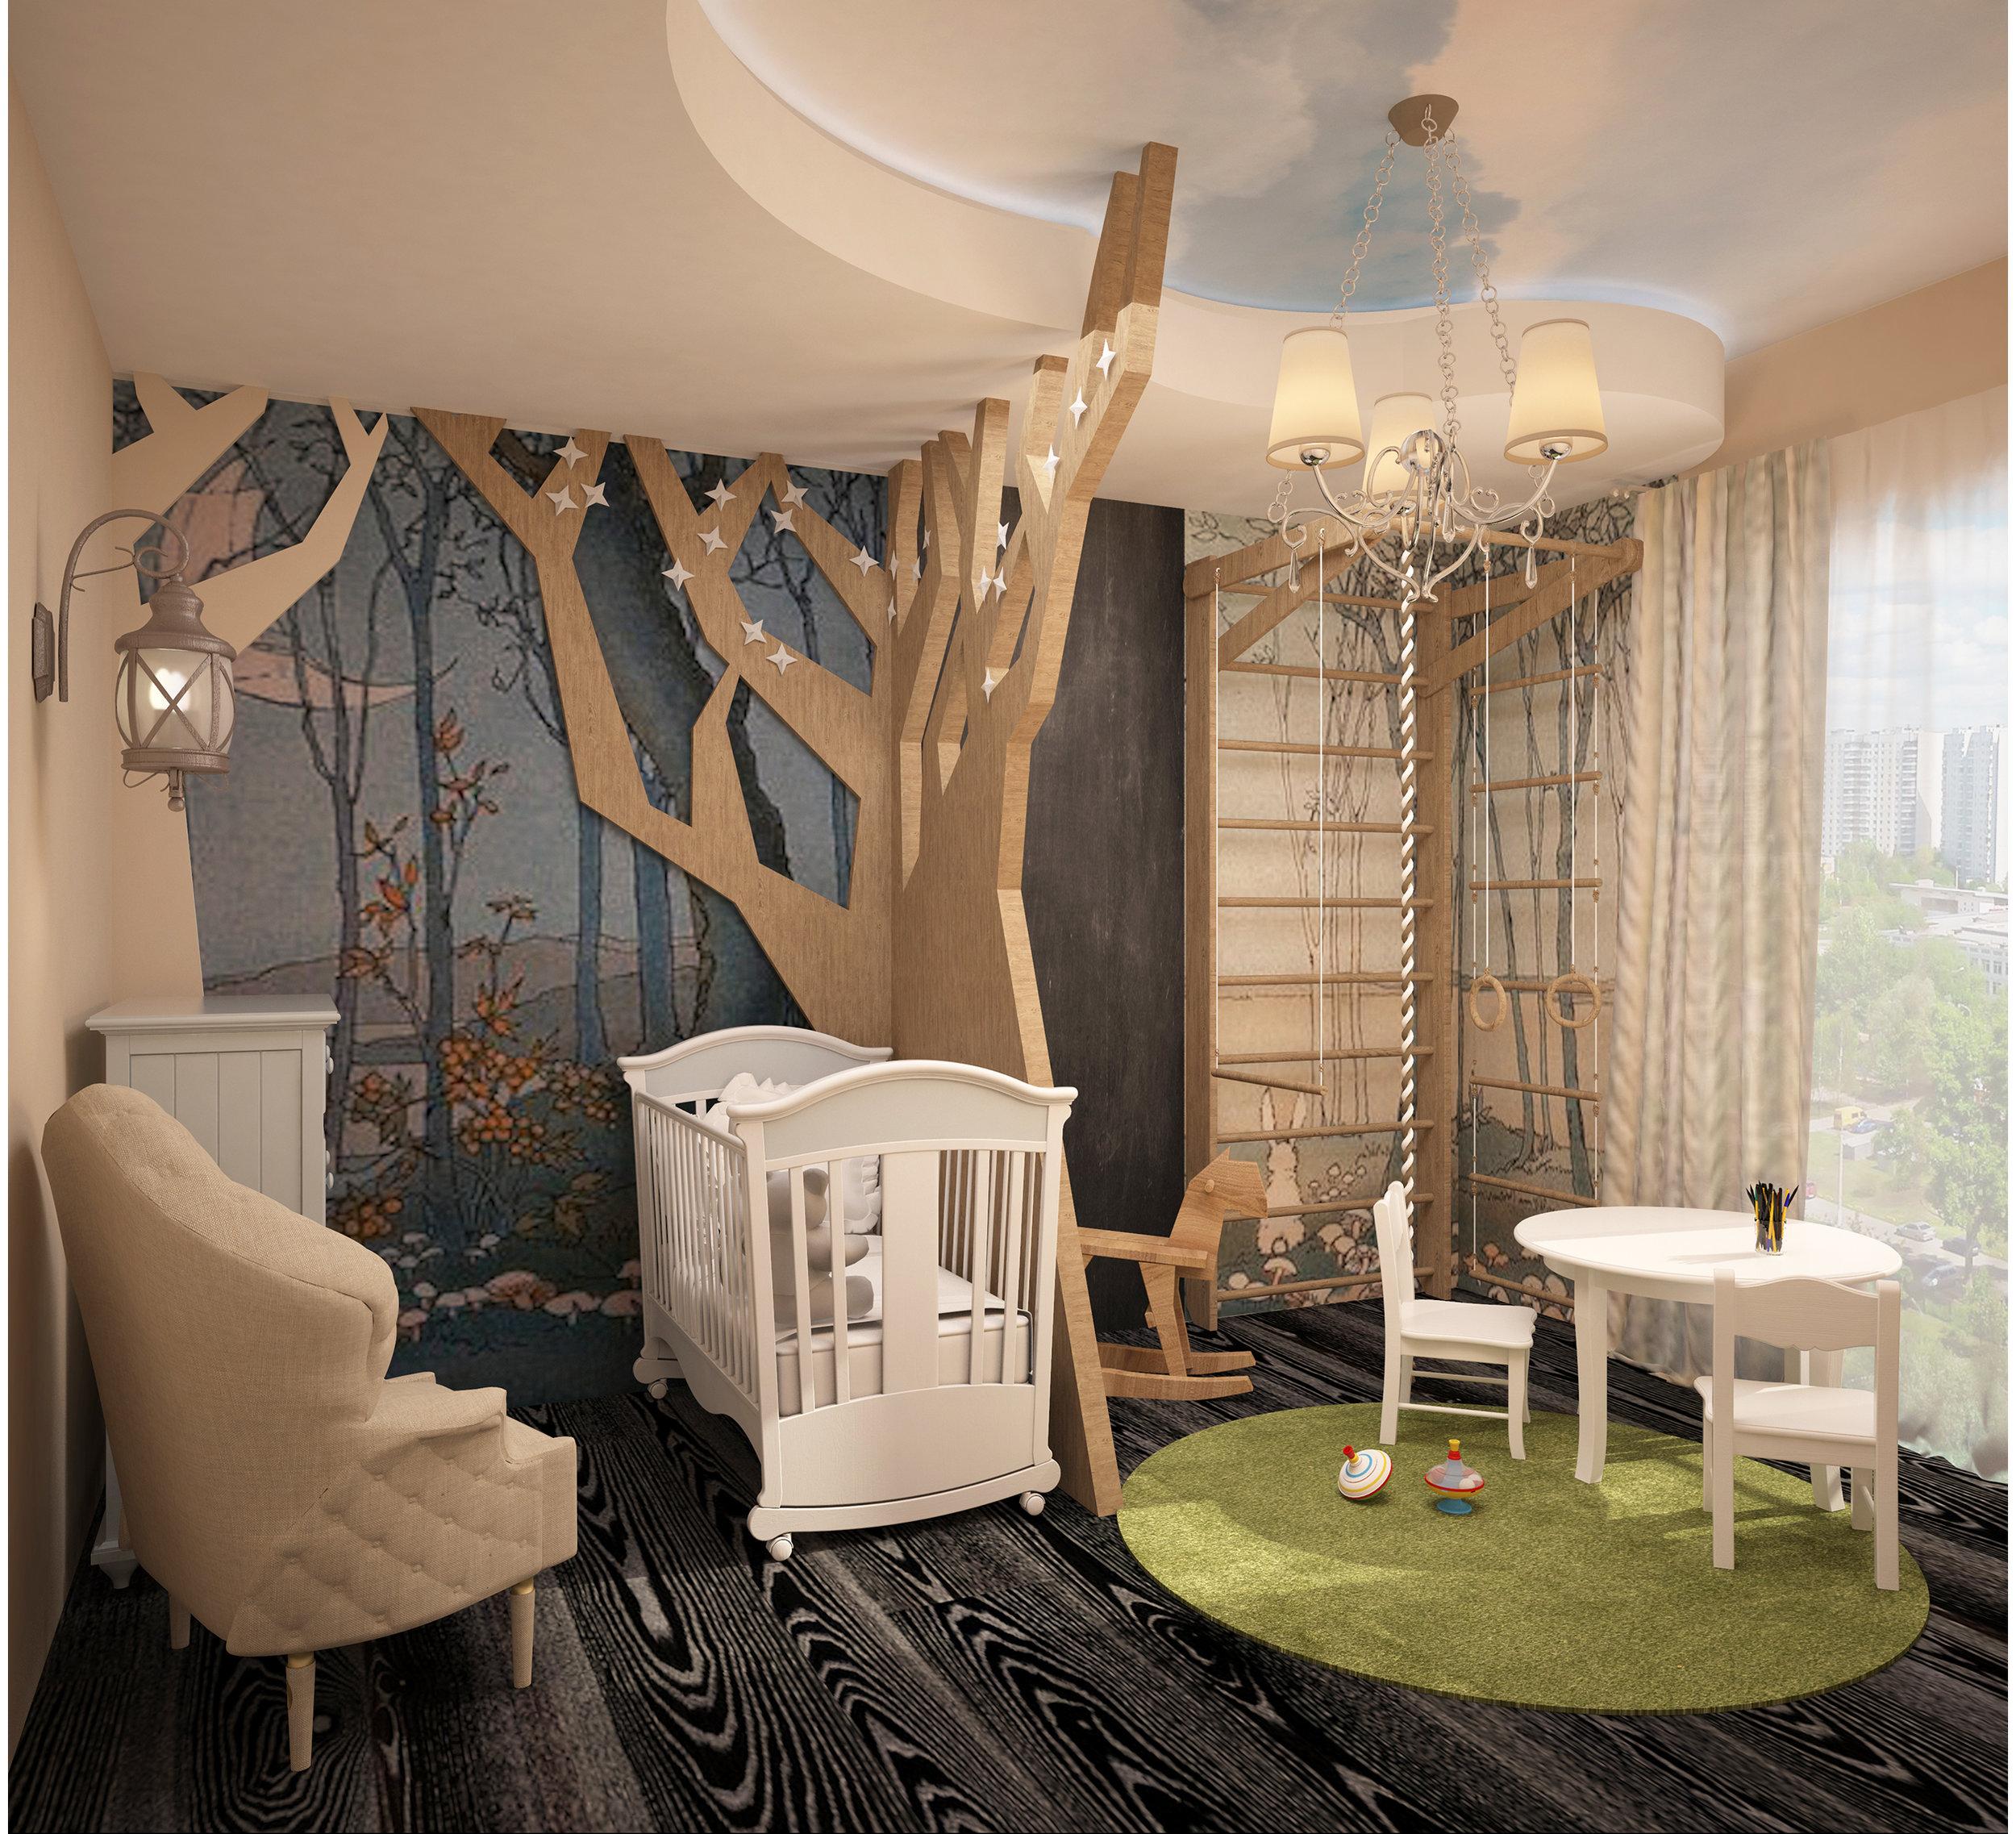 Nursery interior. Fairytale forest.